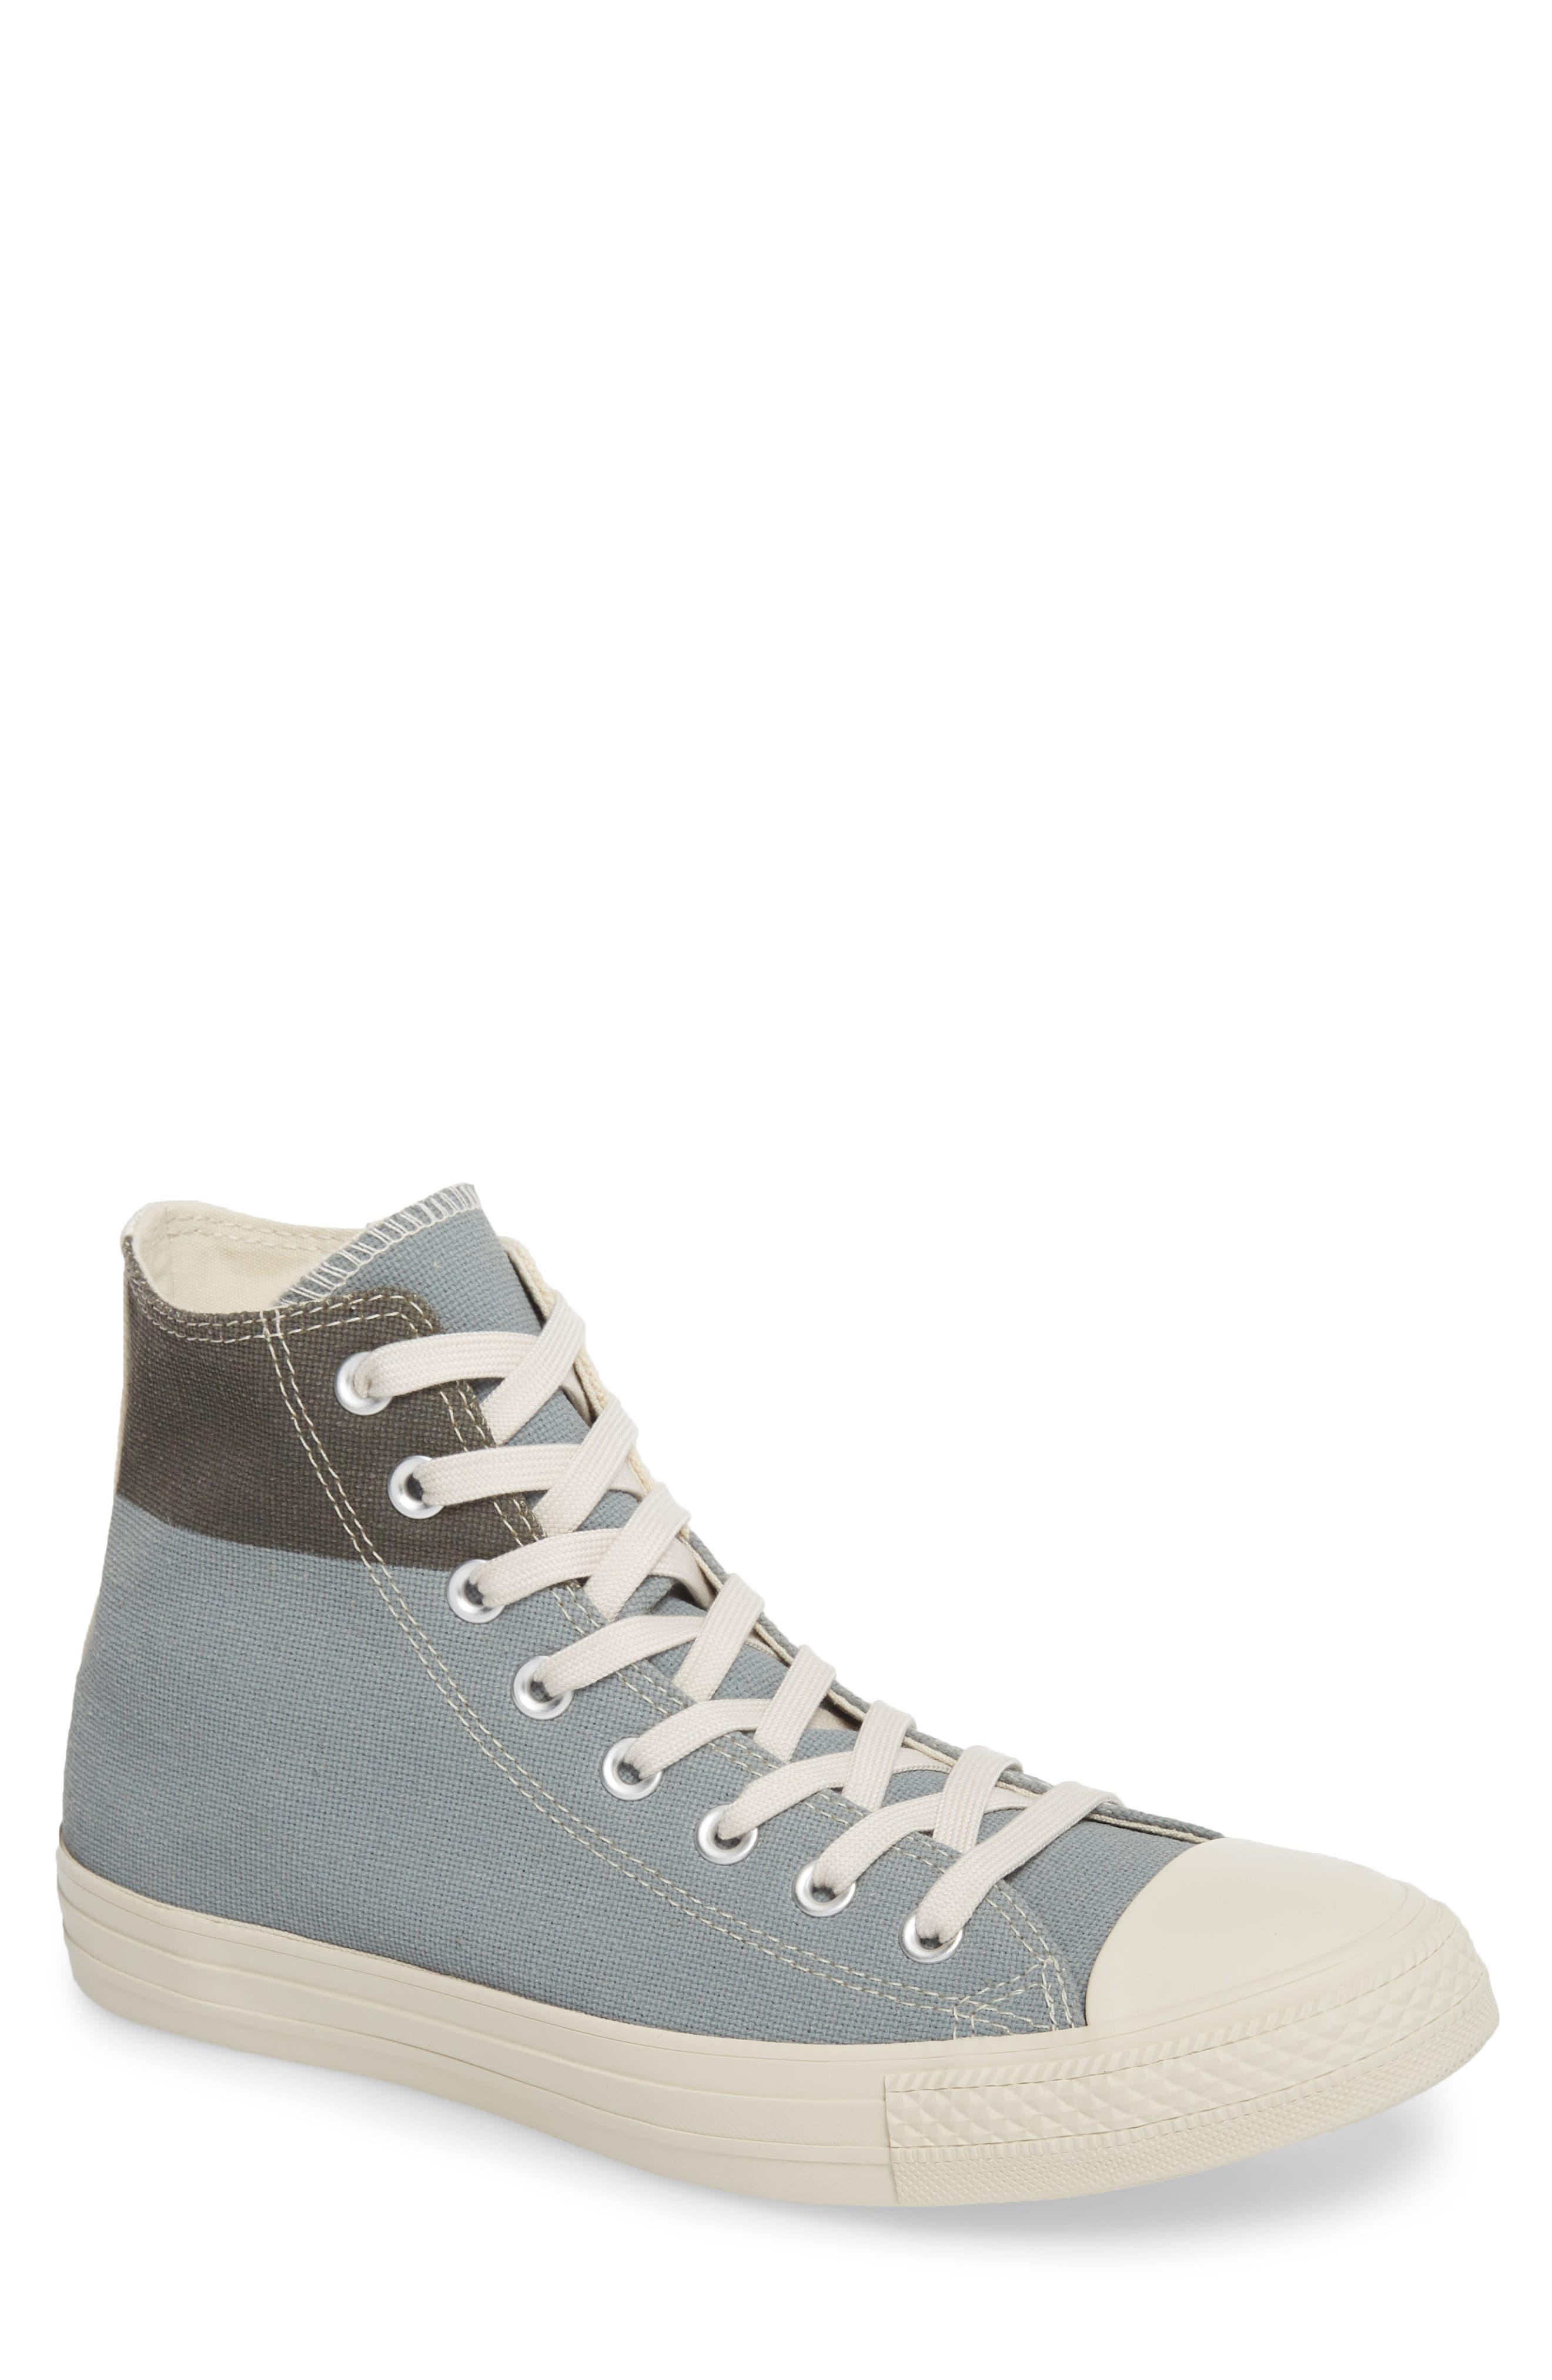 Chuck Taylor<sup>®</sup> All Star<sup>®</sup> Jute Americana High Top Sneaker,                             Main thumbnail 1, color,                             Cool Grey